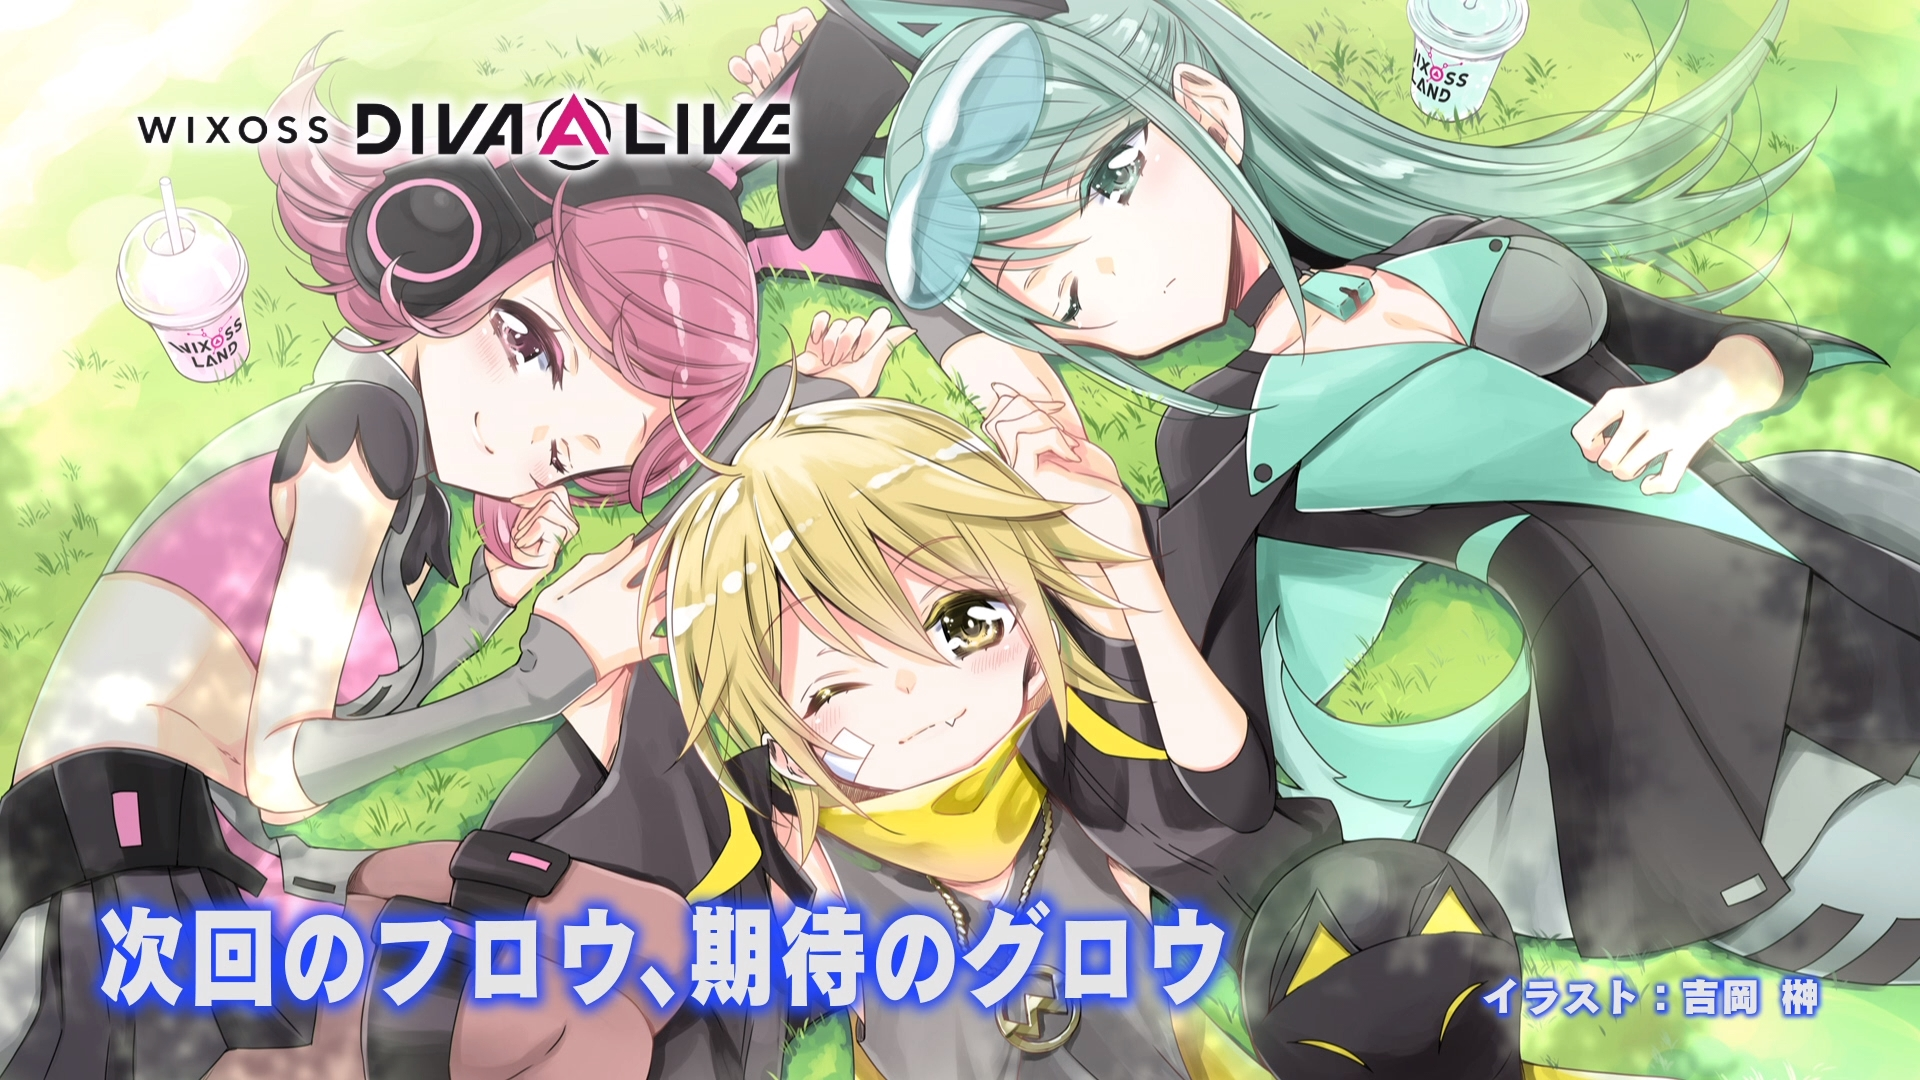 WIXOSS Diva(A)Live Episode 05 Yoshioka Sakaki